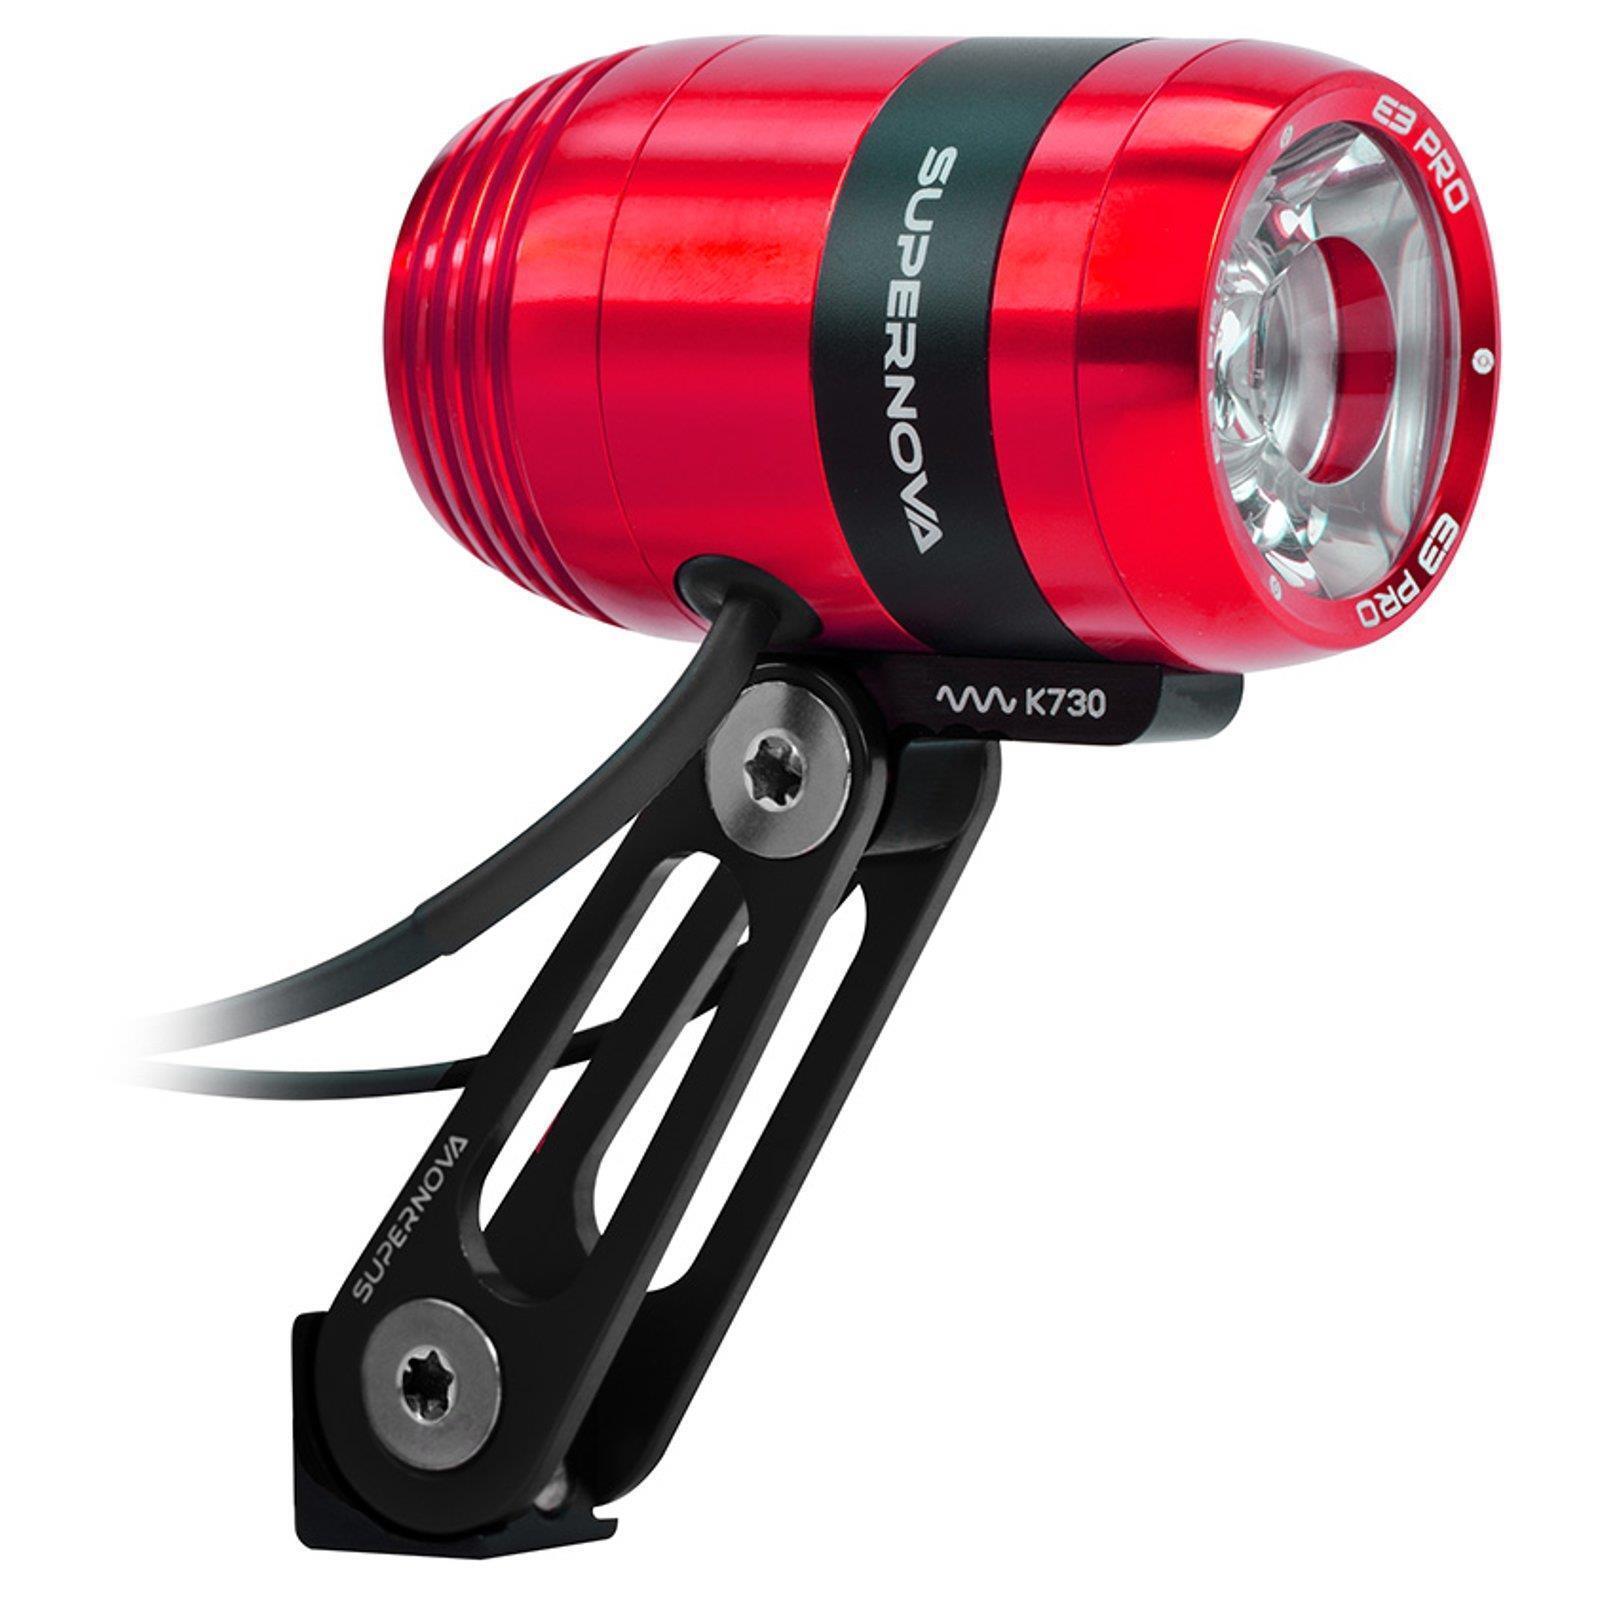 SUPERNOVA E3 Pro 2 Terraflux 2 red LED Lumen Dynamo Fahrrad Lampe mit Standlicht